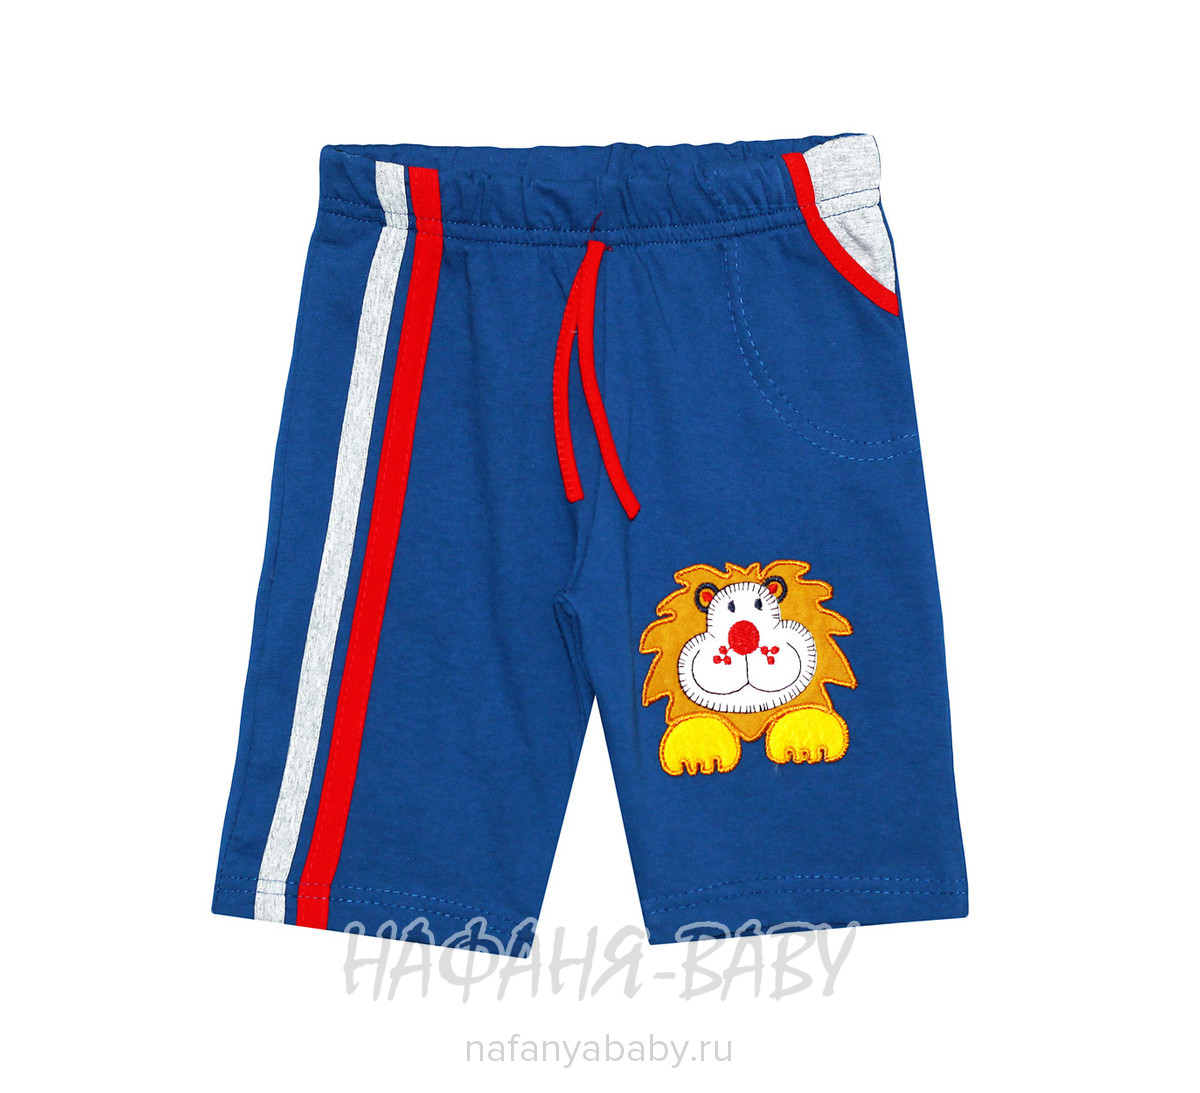 Детские шорты BADICAN арт: 8151, 1-4 года, цвет желтый, оптом Турция